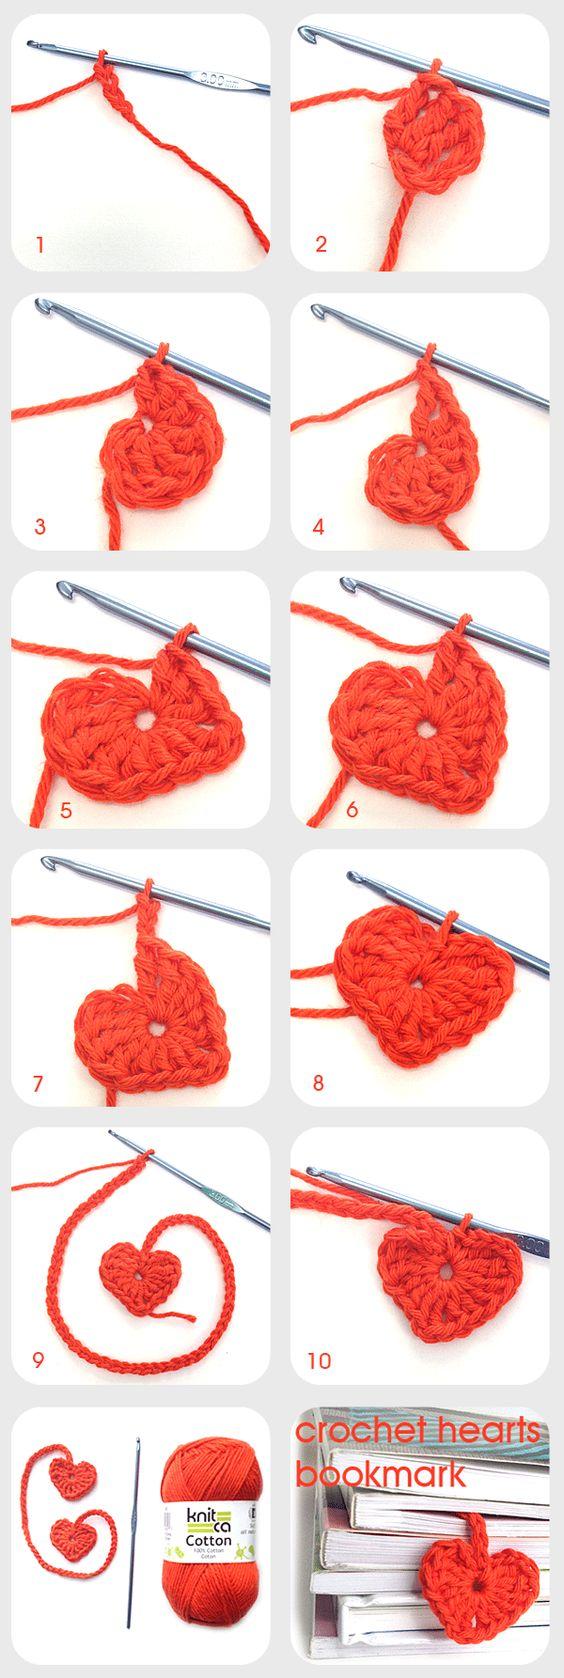 Crochet Hearts Bookmark.